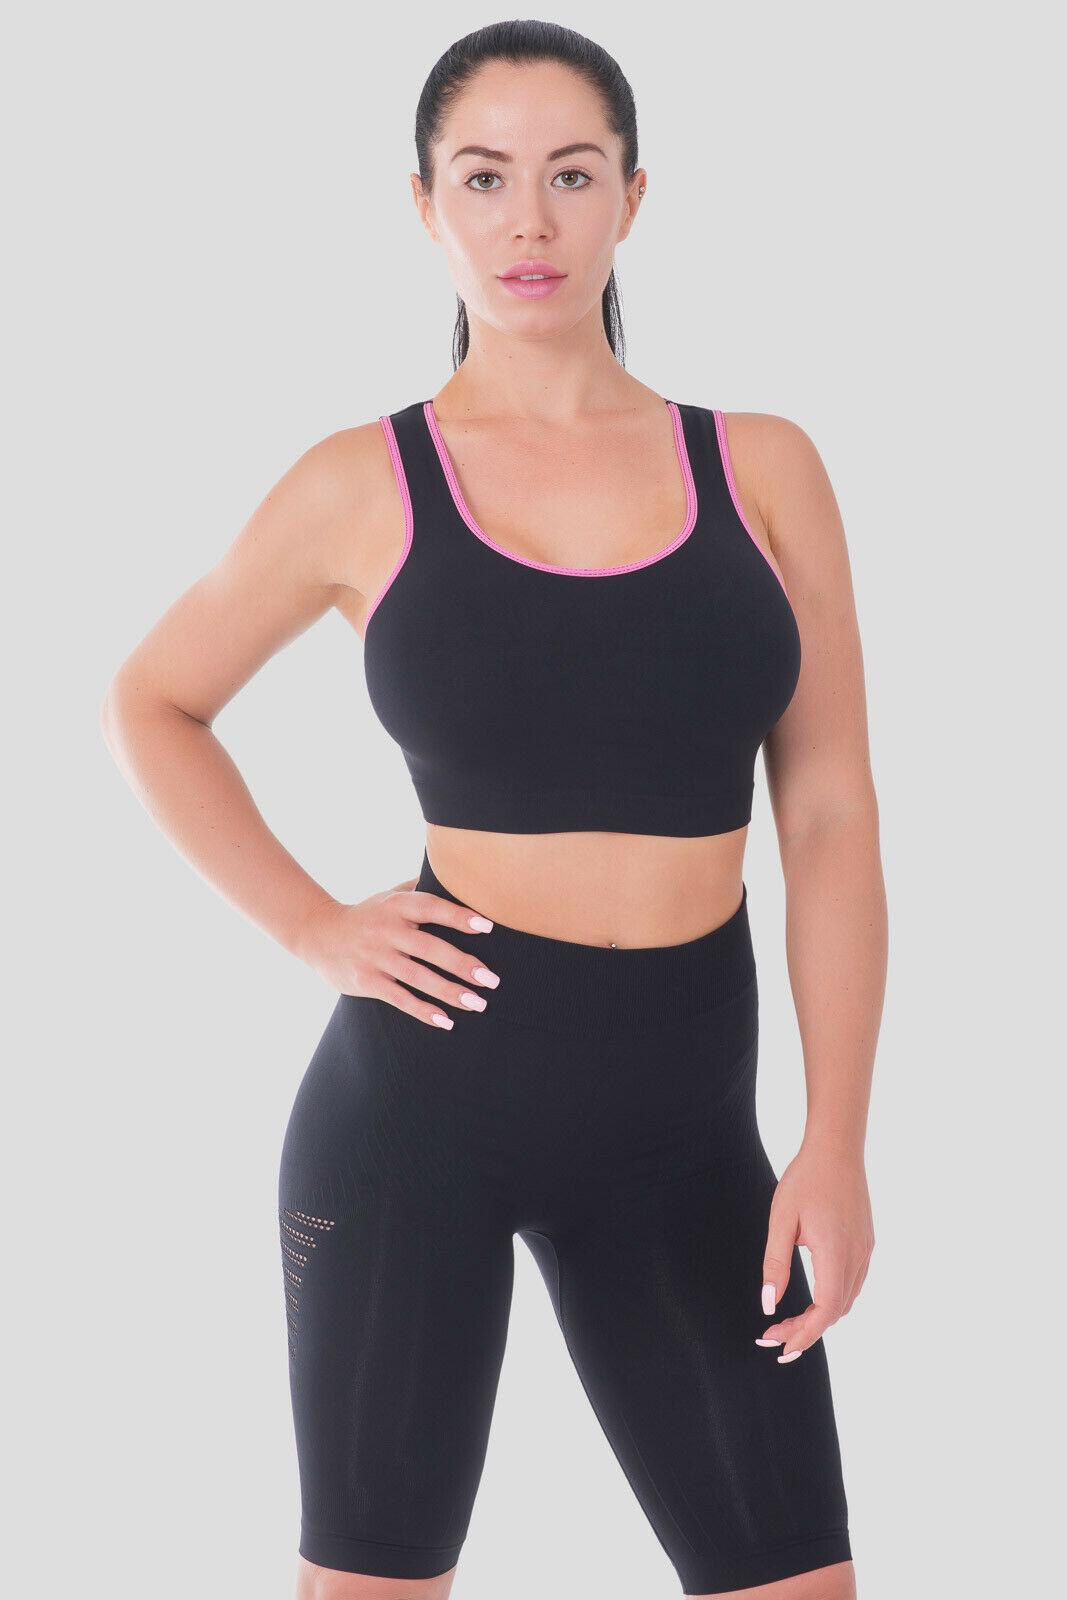 Bellissima-Women-039-s-Sport-Bra-Running-Yoga-Workout-Fitness-Racerback-Seamless thumbnail 27